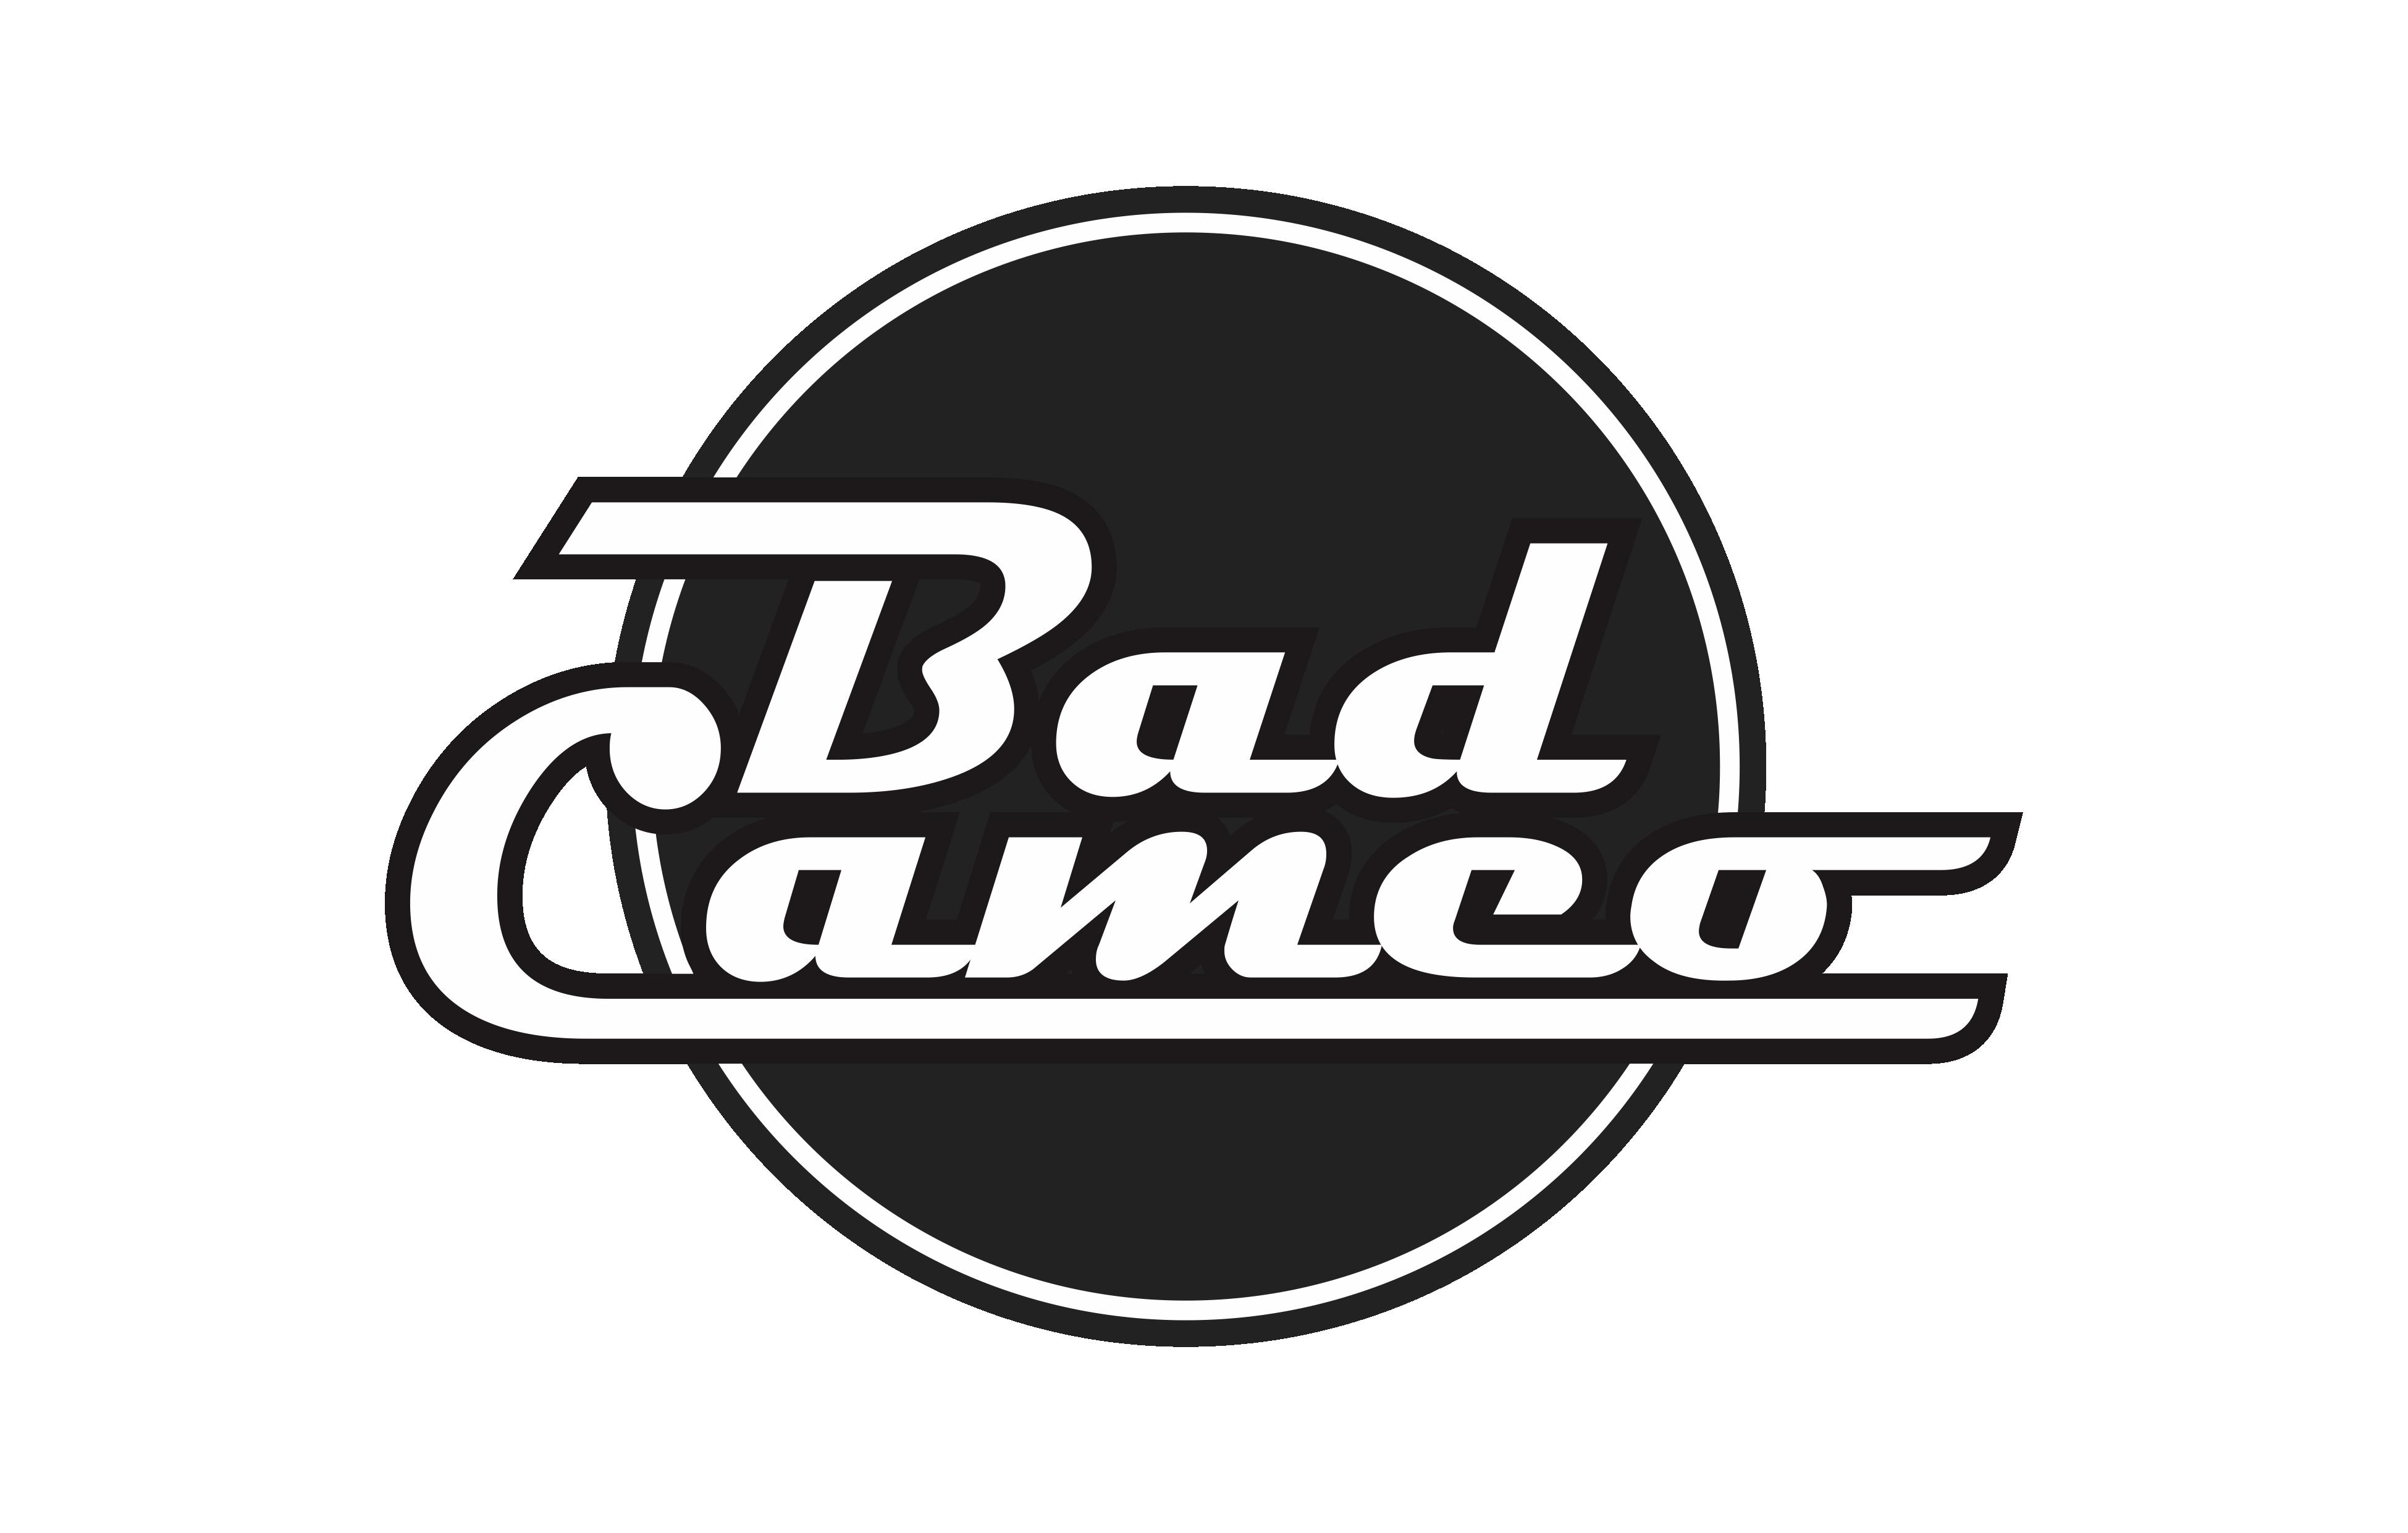 BadCameo